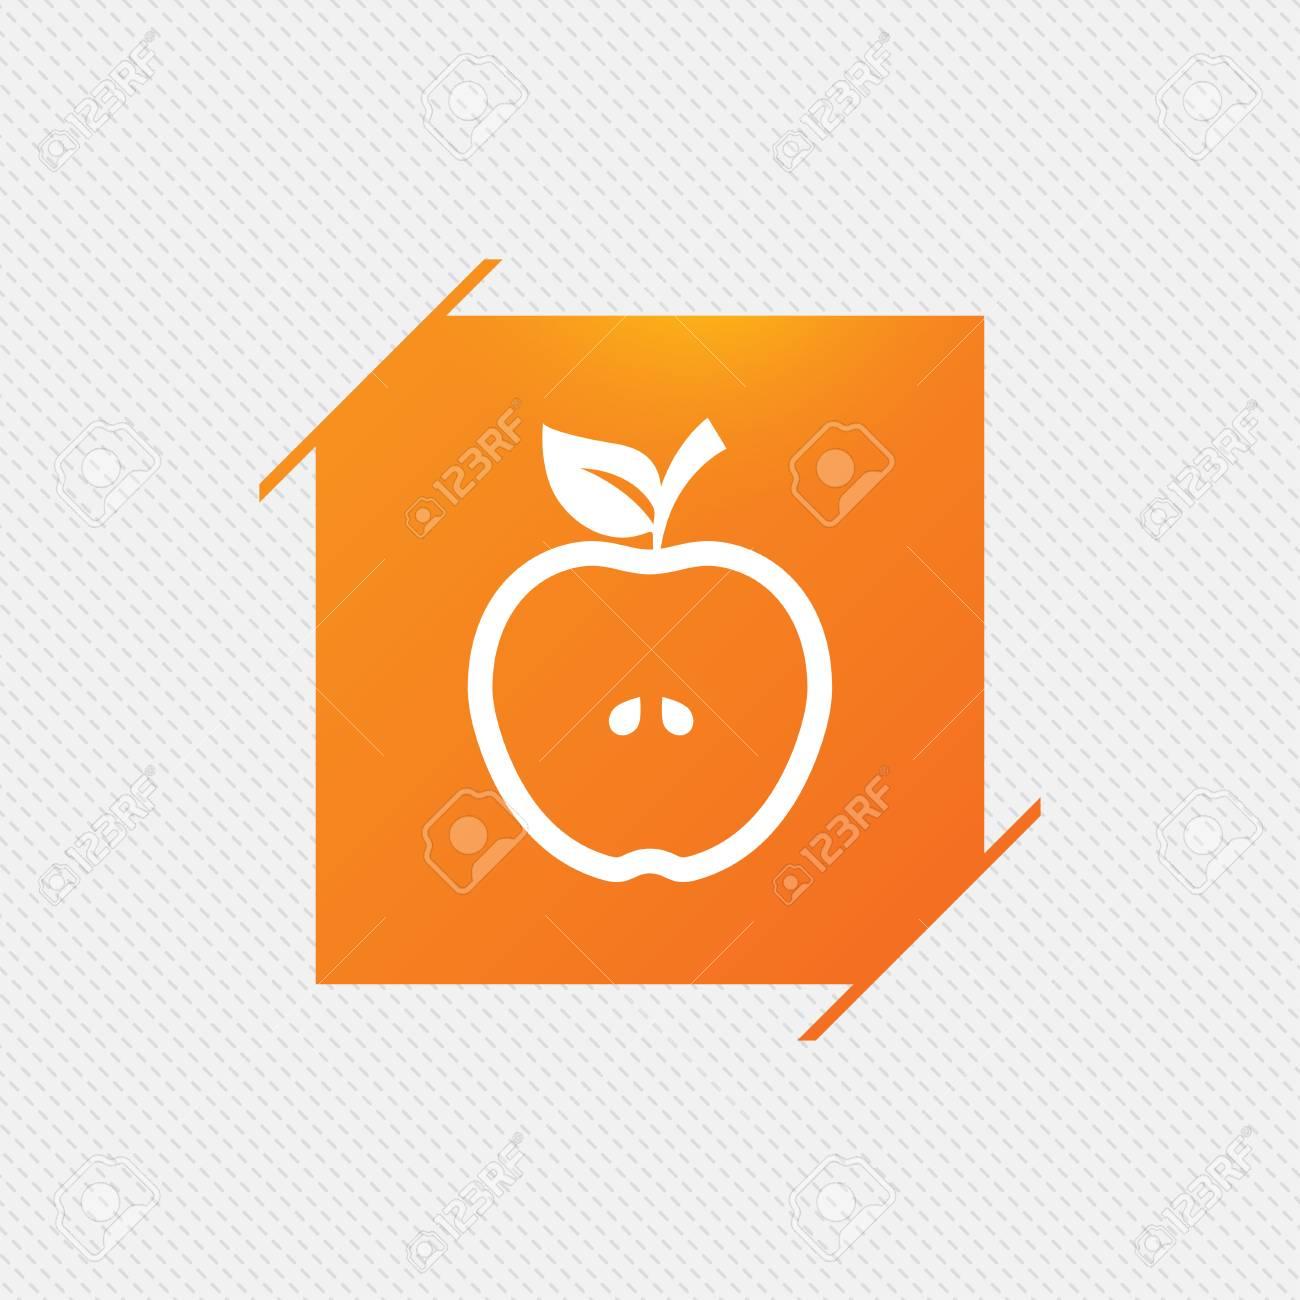 apple sign icon. fruit with leaf symbol. orange square label